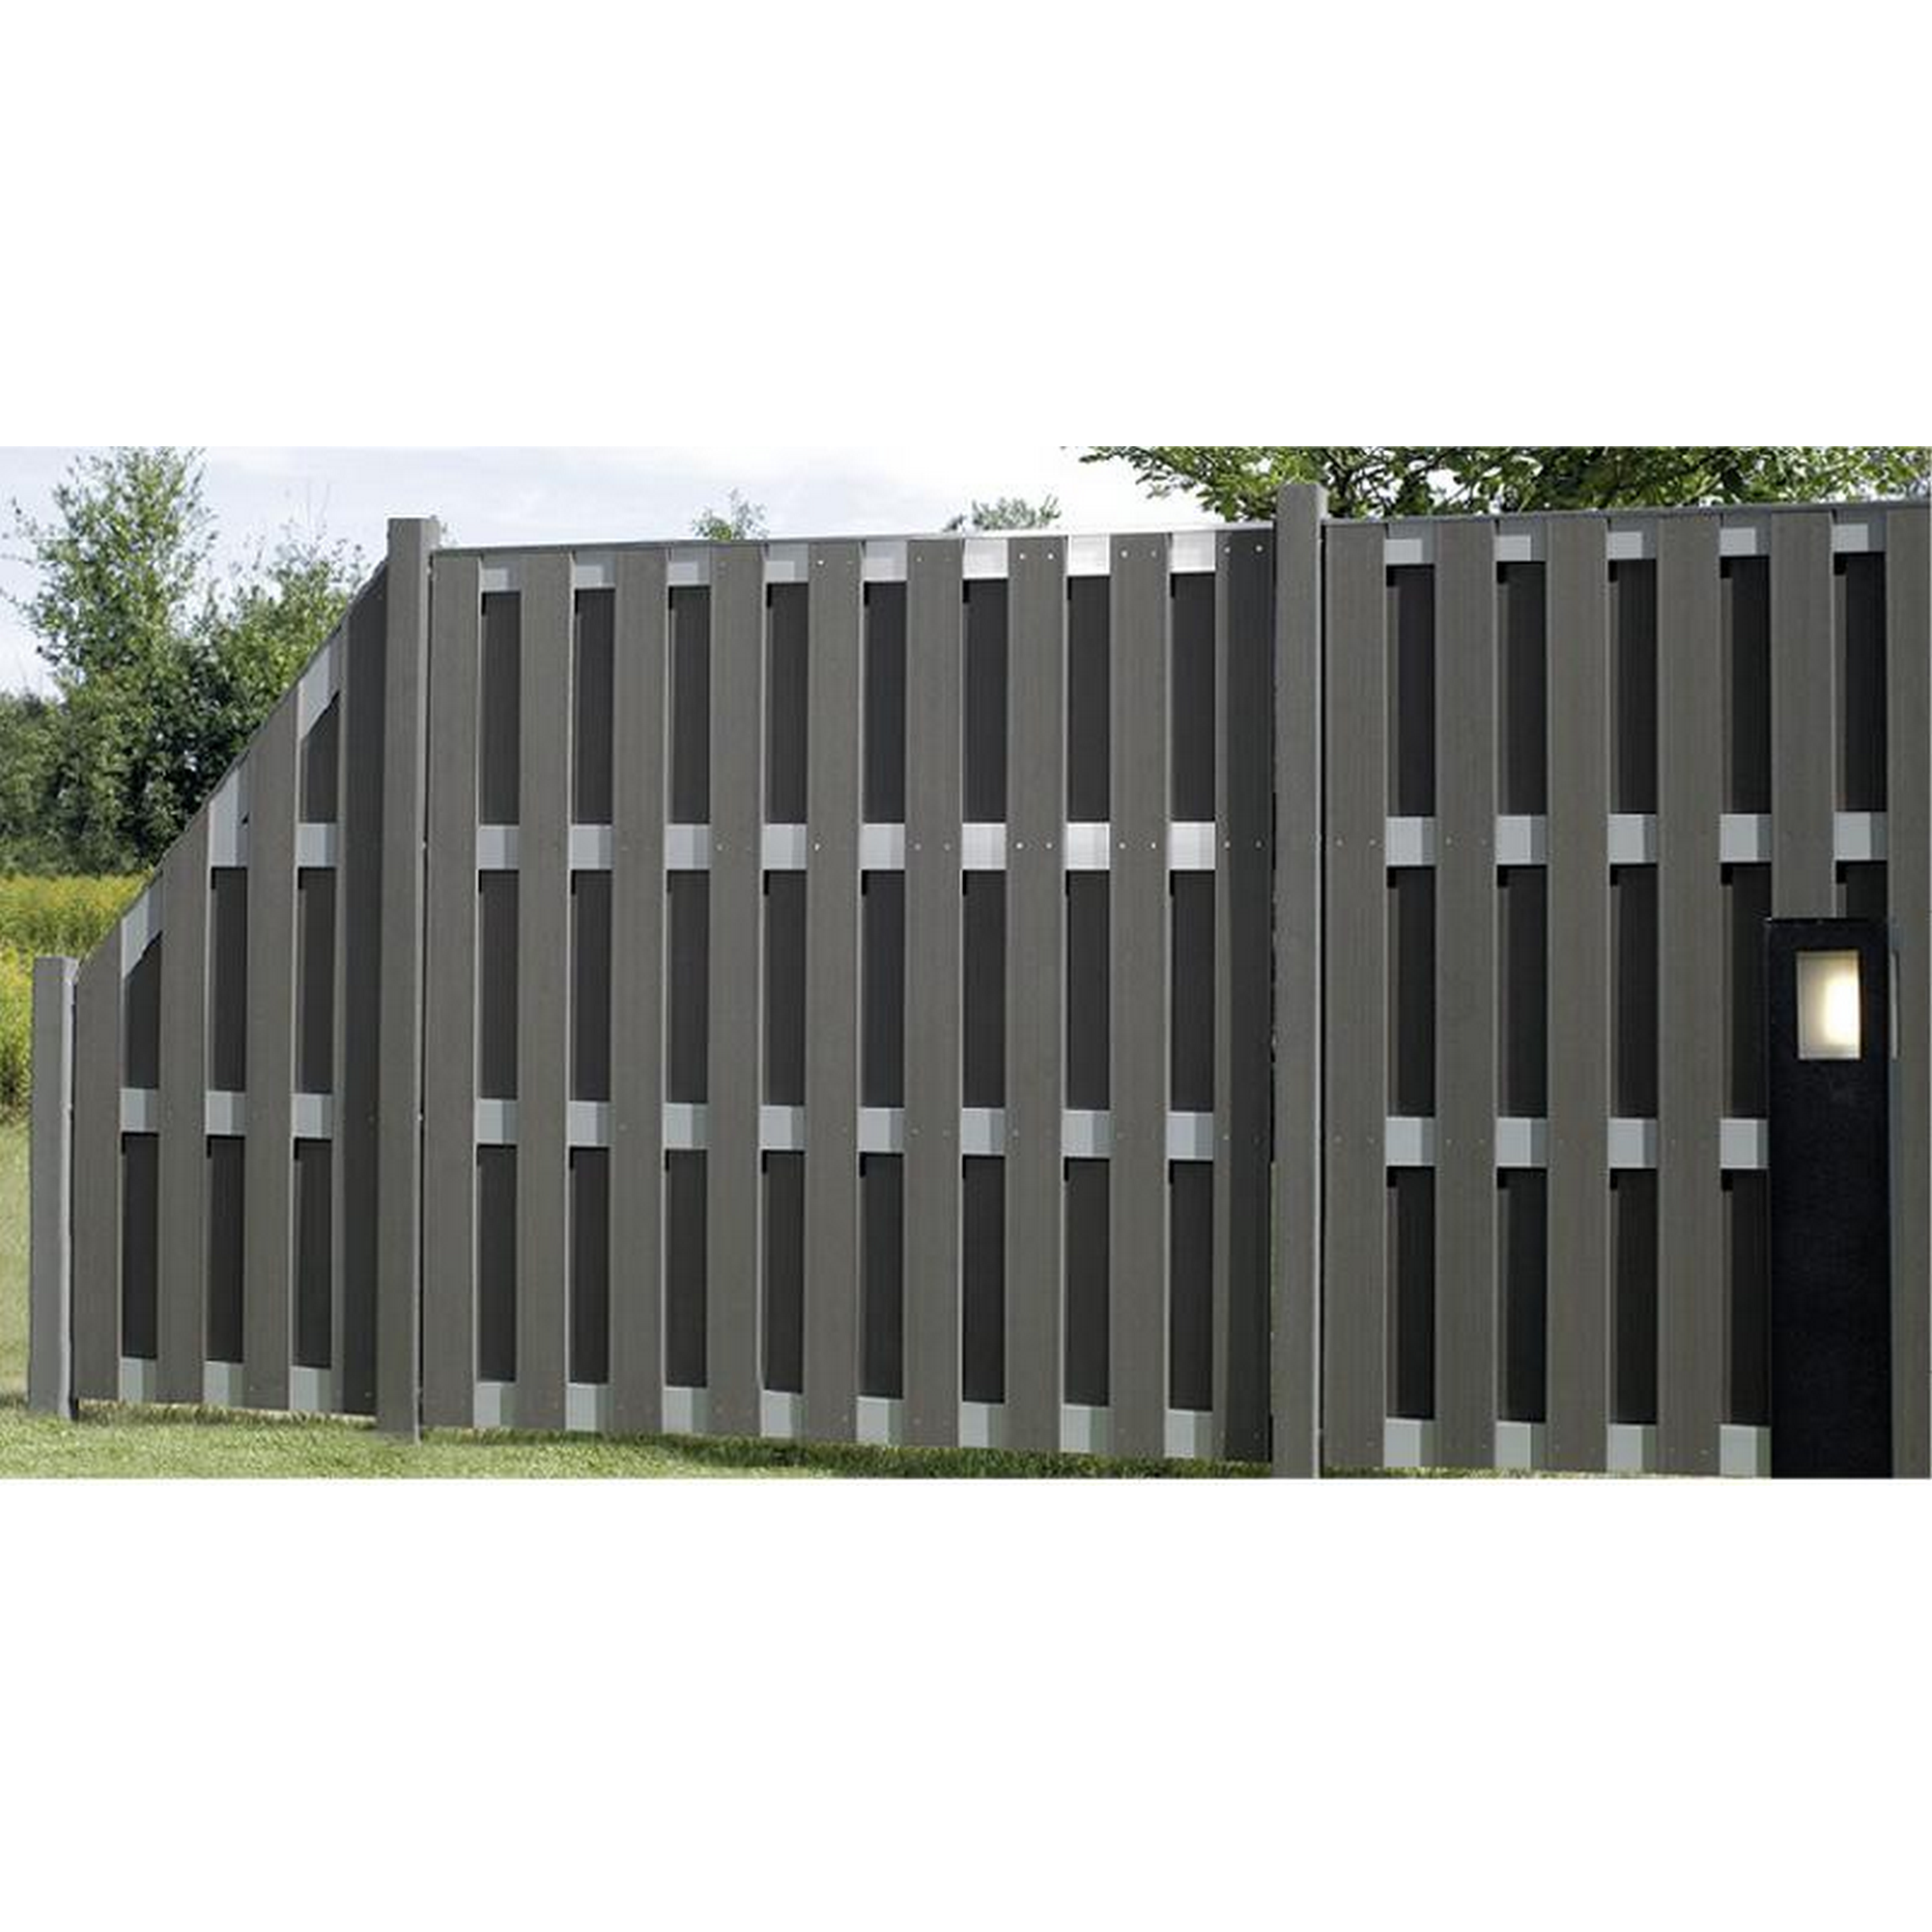 Zaunelement Jumbo Wpc Alu Anthrazit 74 X 179 Cm ǀ Toom Baumarkt